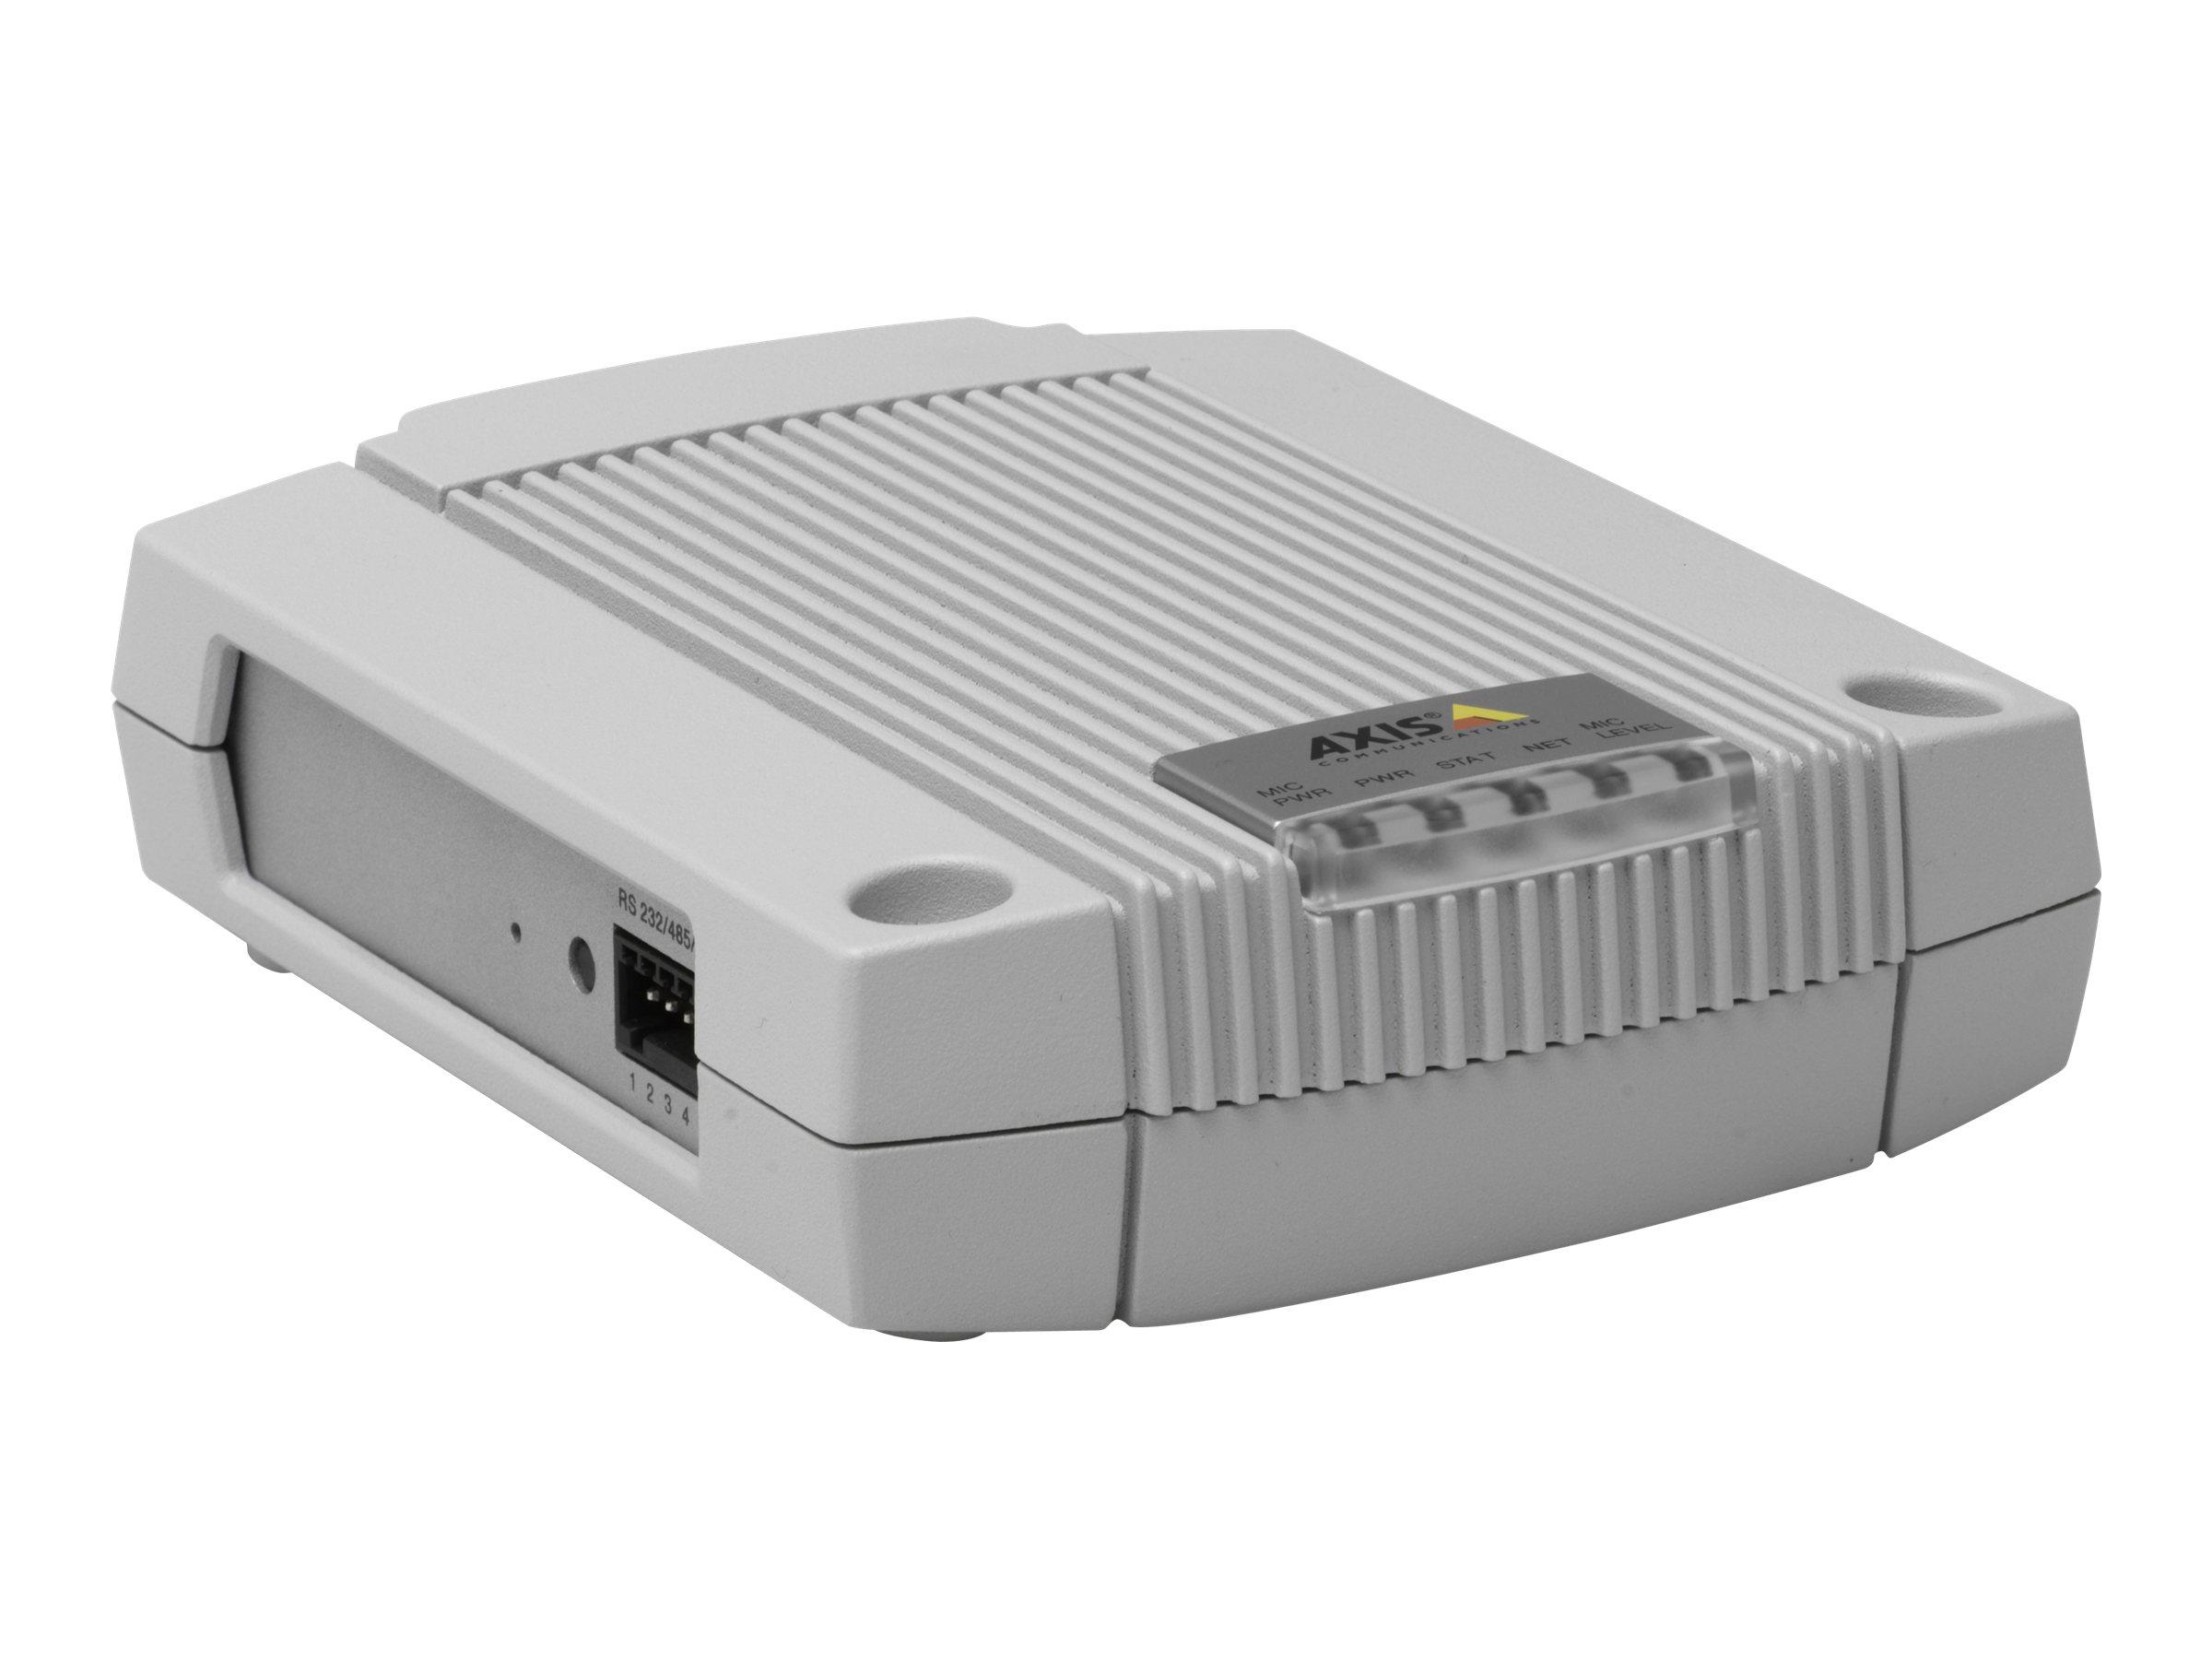 AXIS P8221 Network I/O Audio Module - Erweiterungsmodul